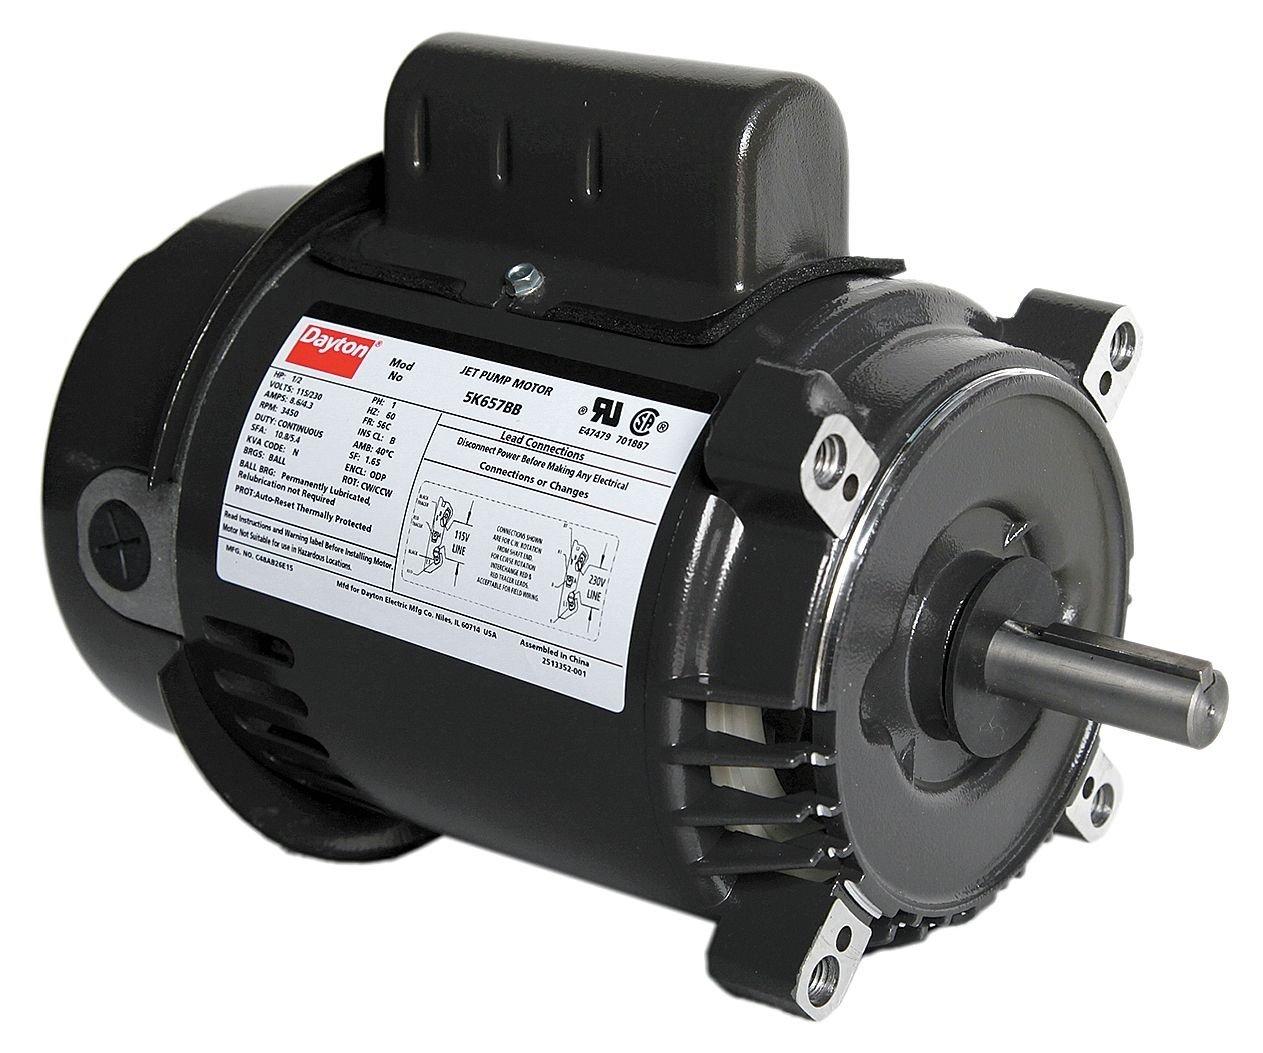 Dayton 5K657 Motor, 1/2 hp, Jet Pump, Degrees_Fahrenheit, to Volts, Amps, (